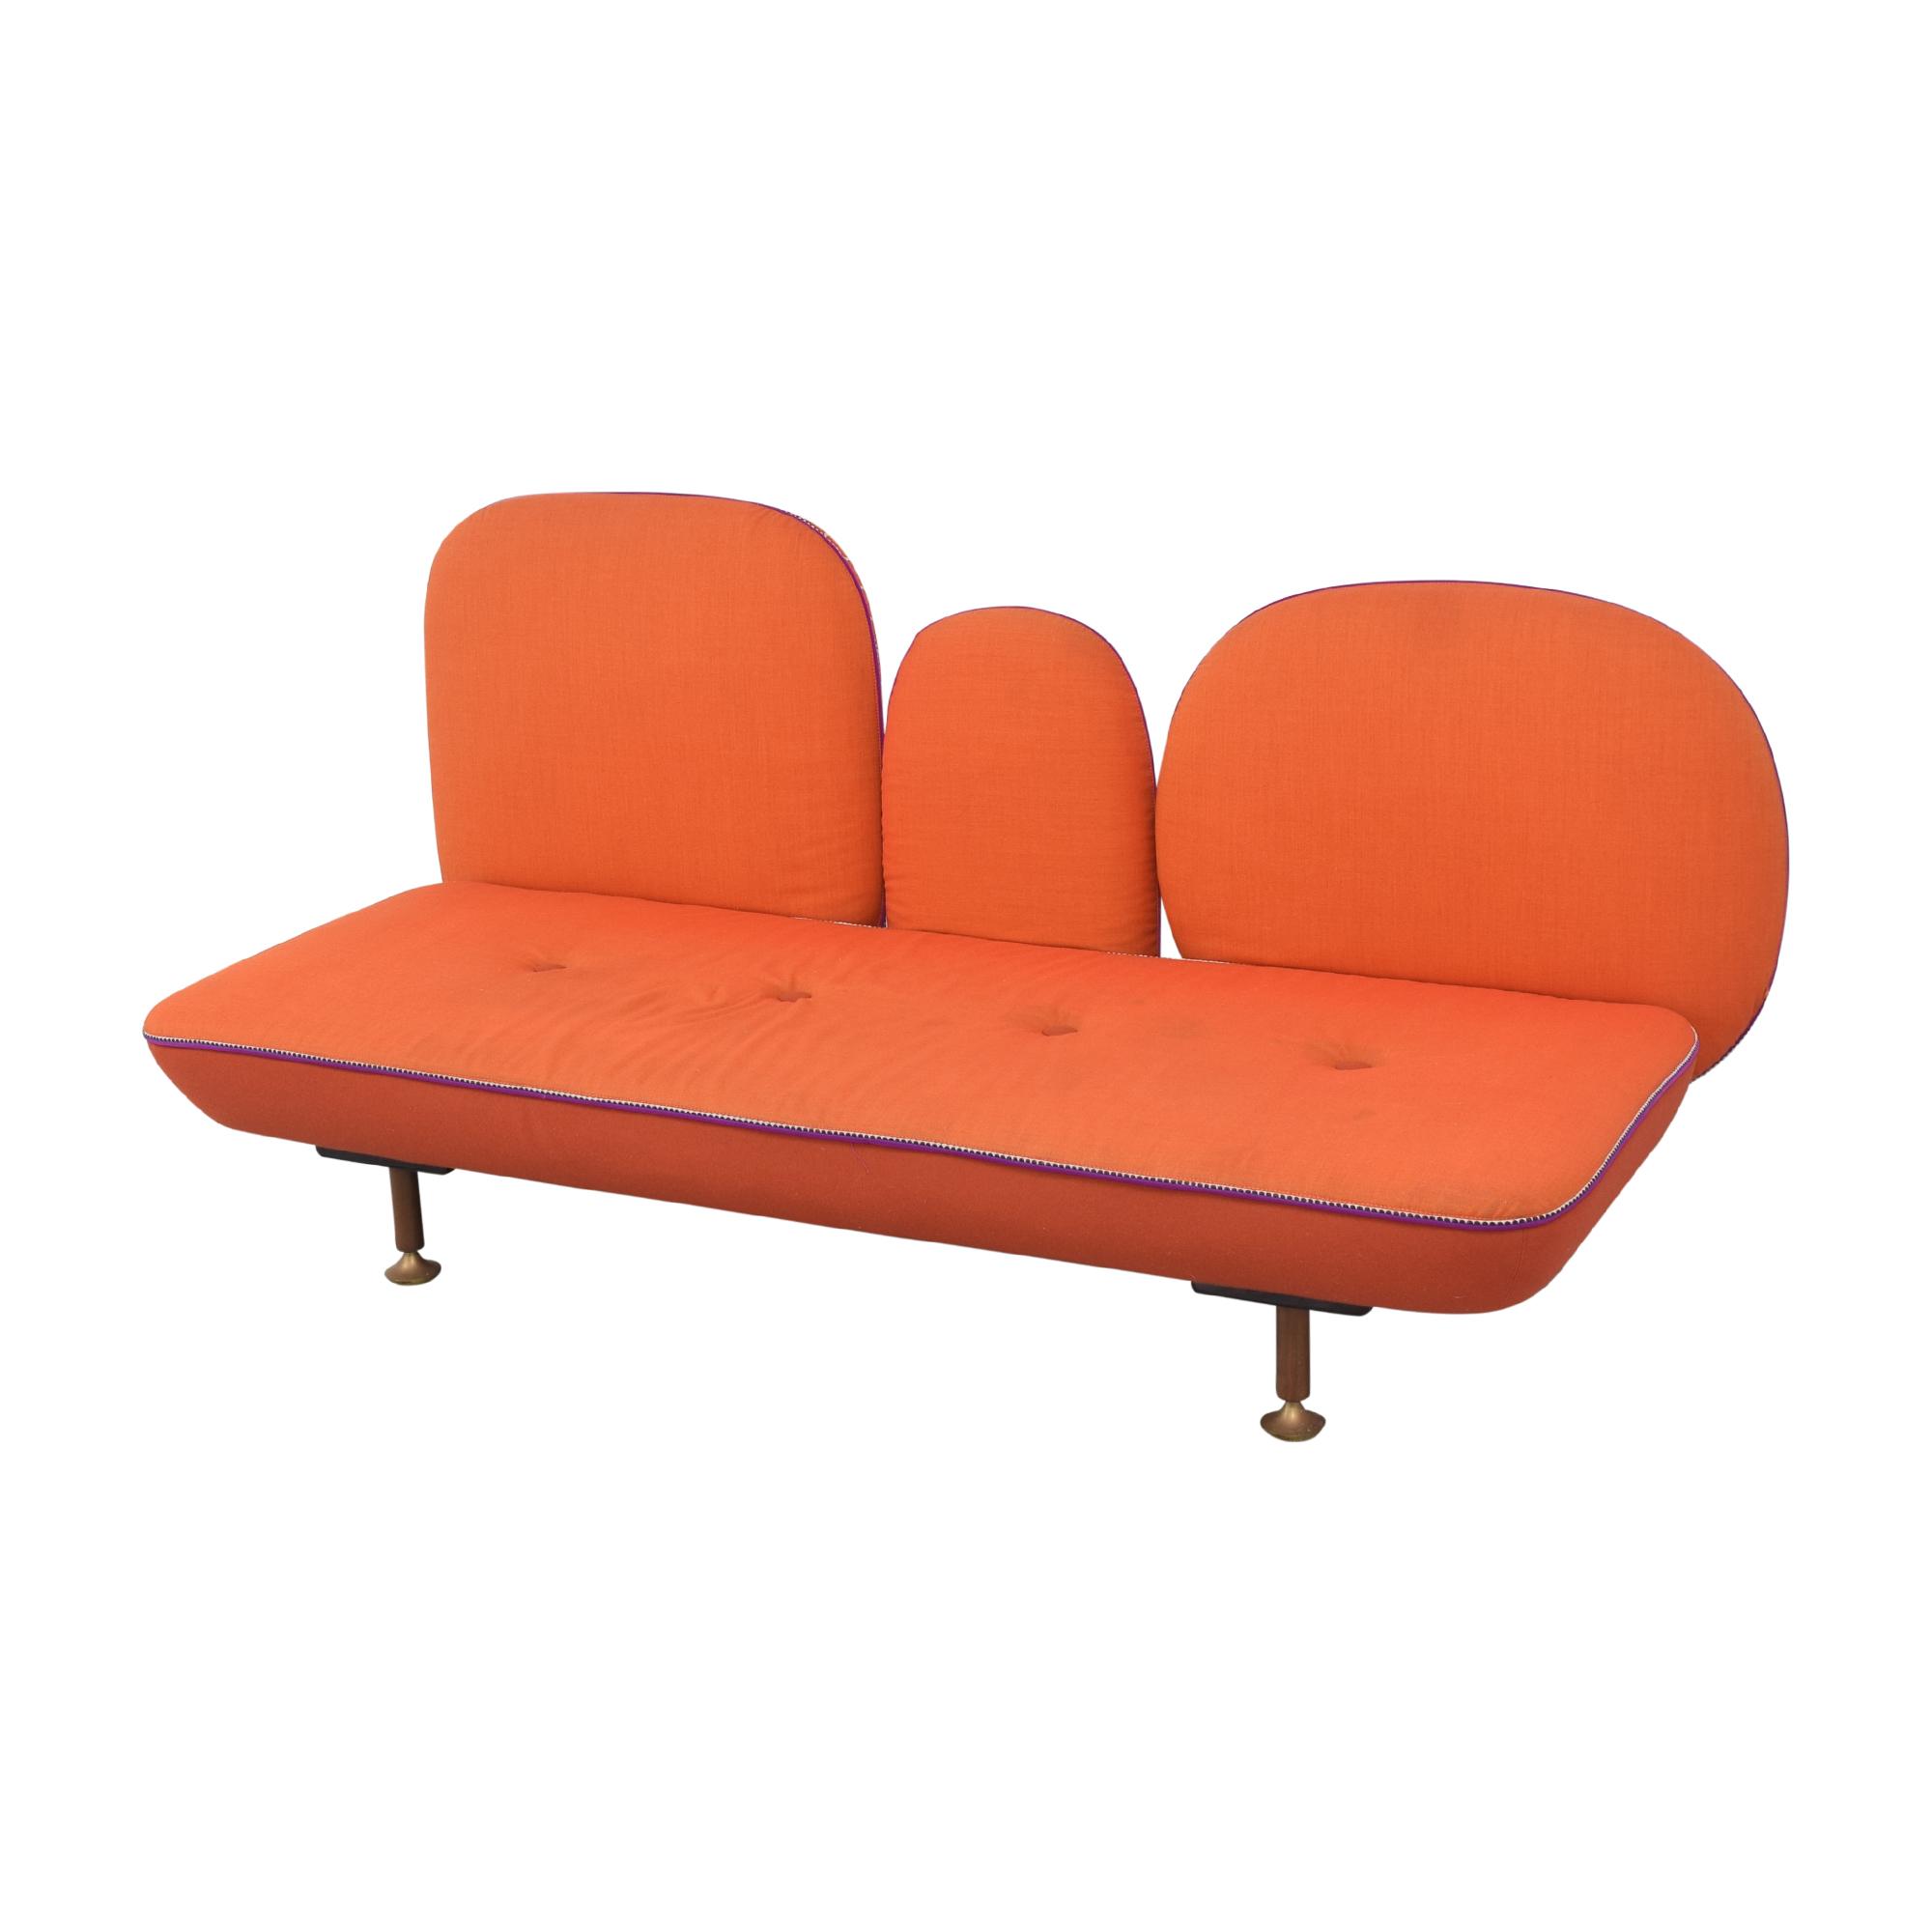 Moroso Moroso My Beautiful Backside Sofa Sofas